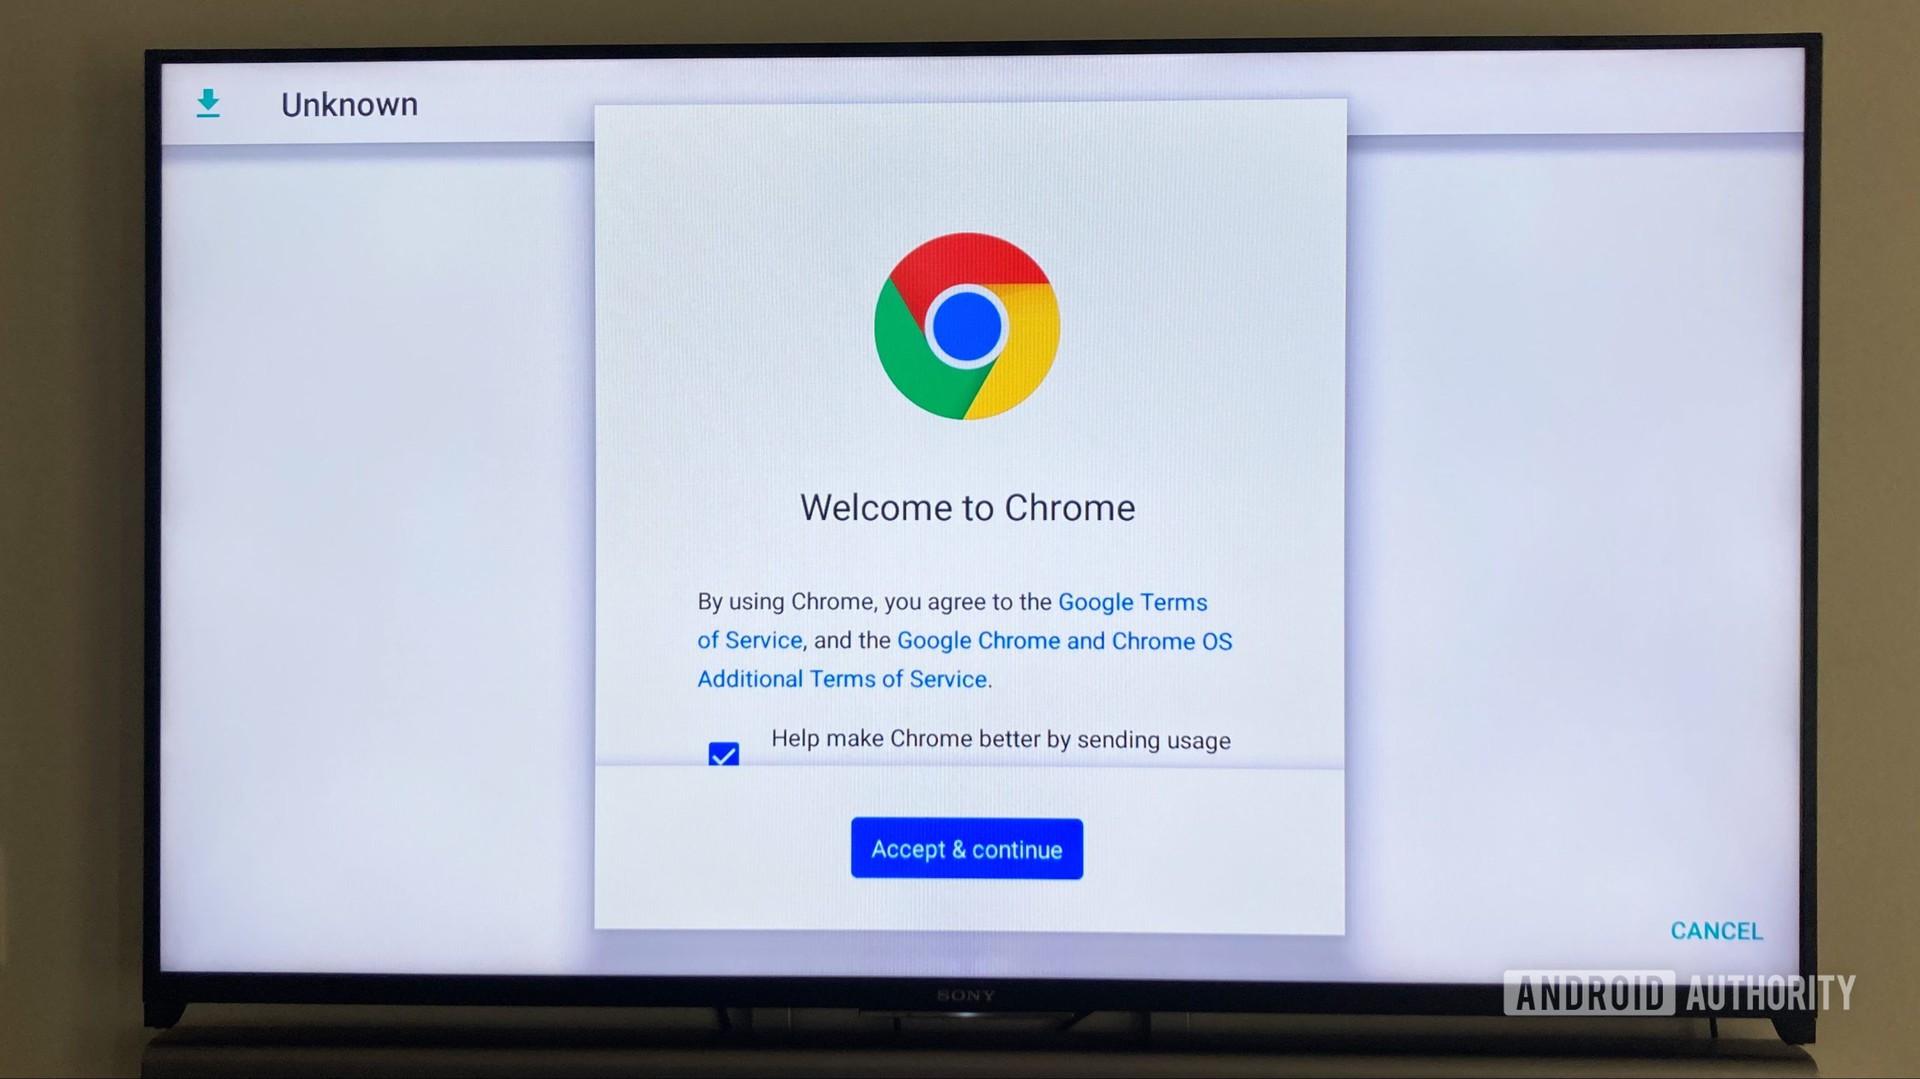 Google Chrome App On Android TV